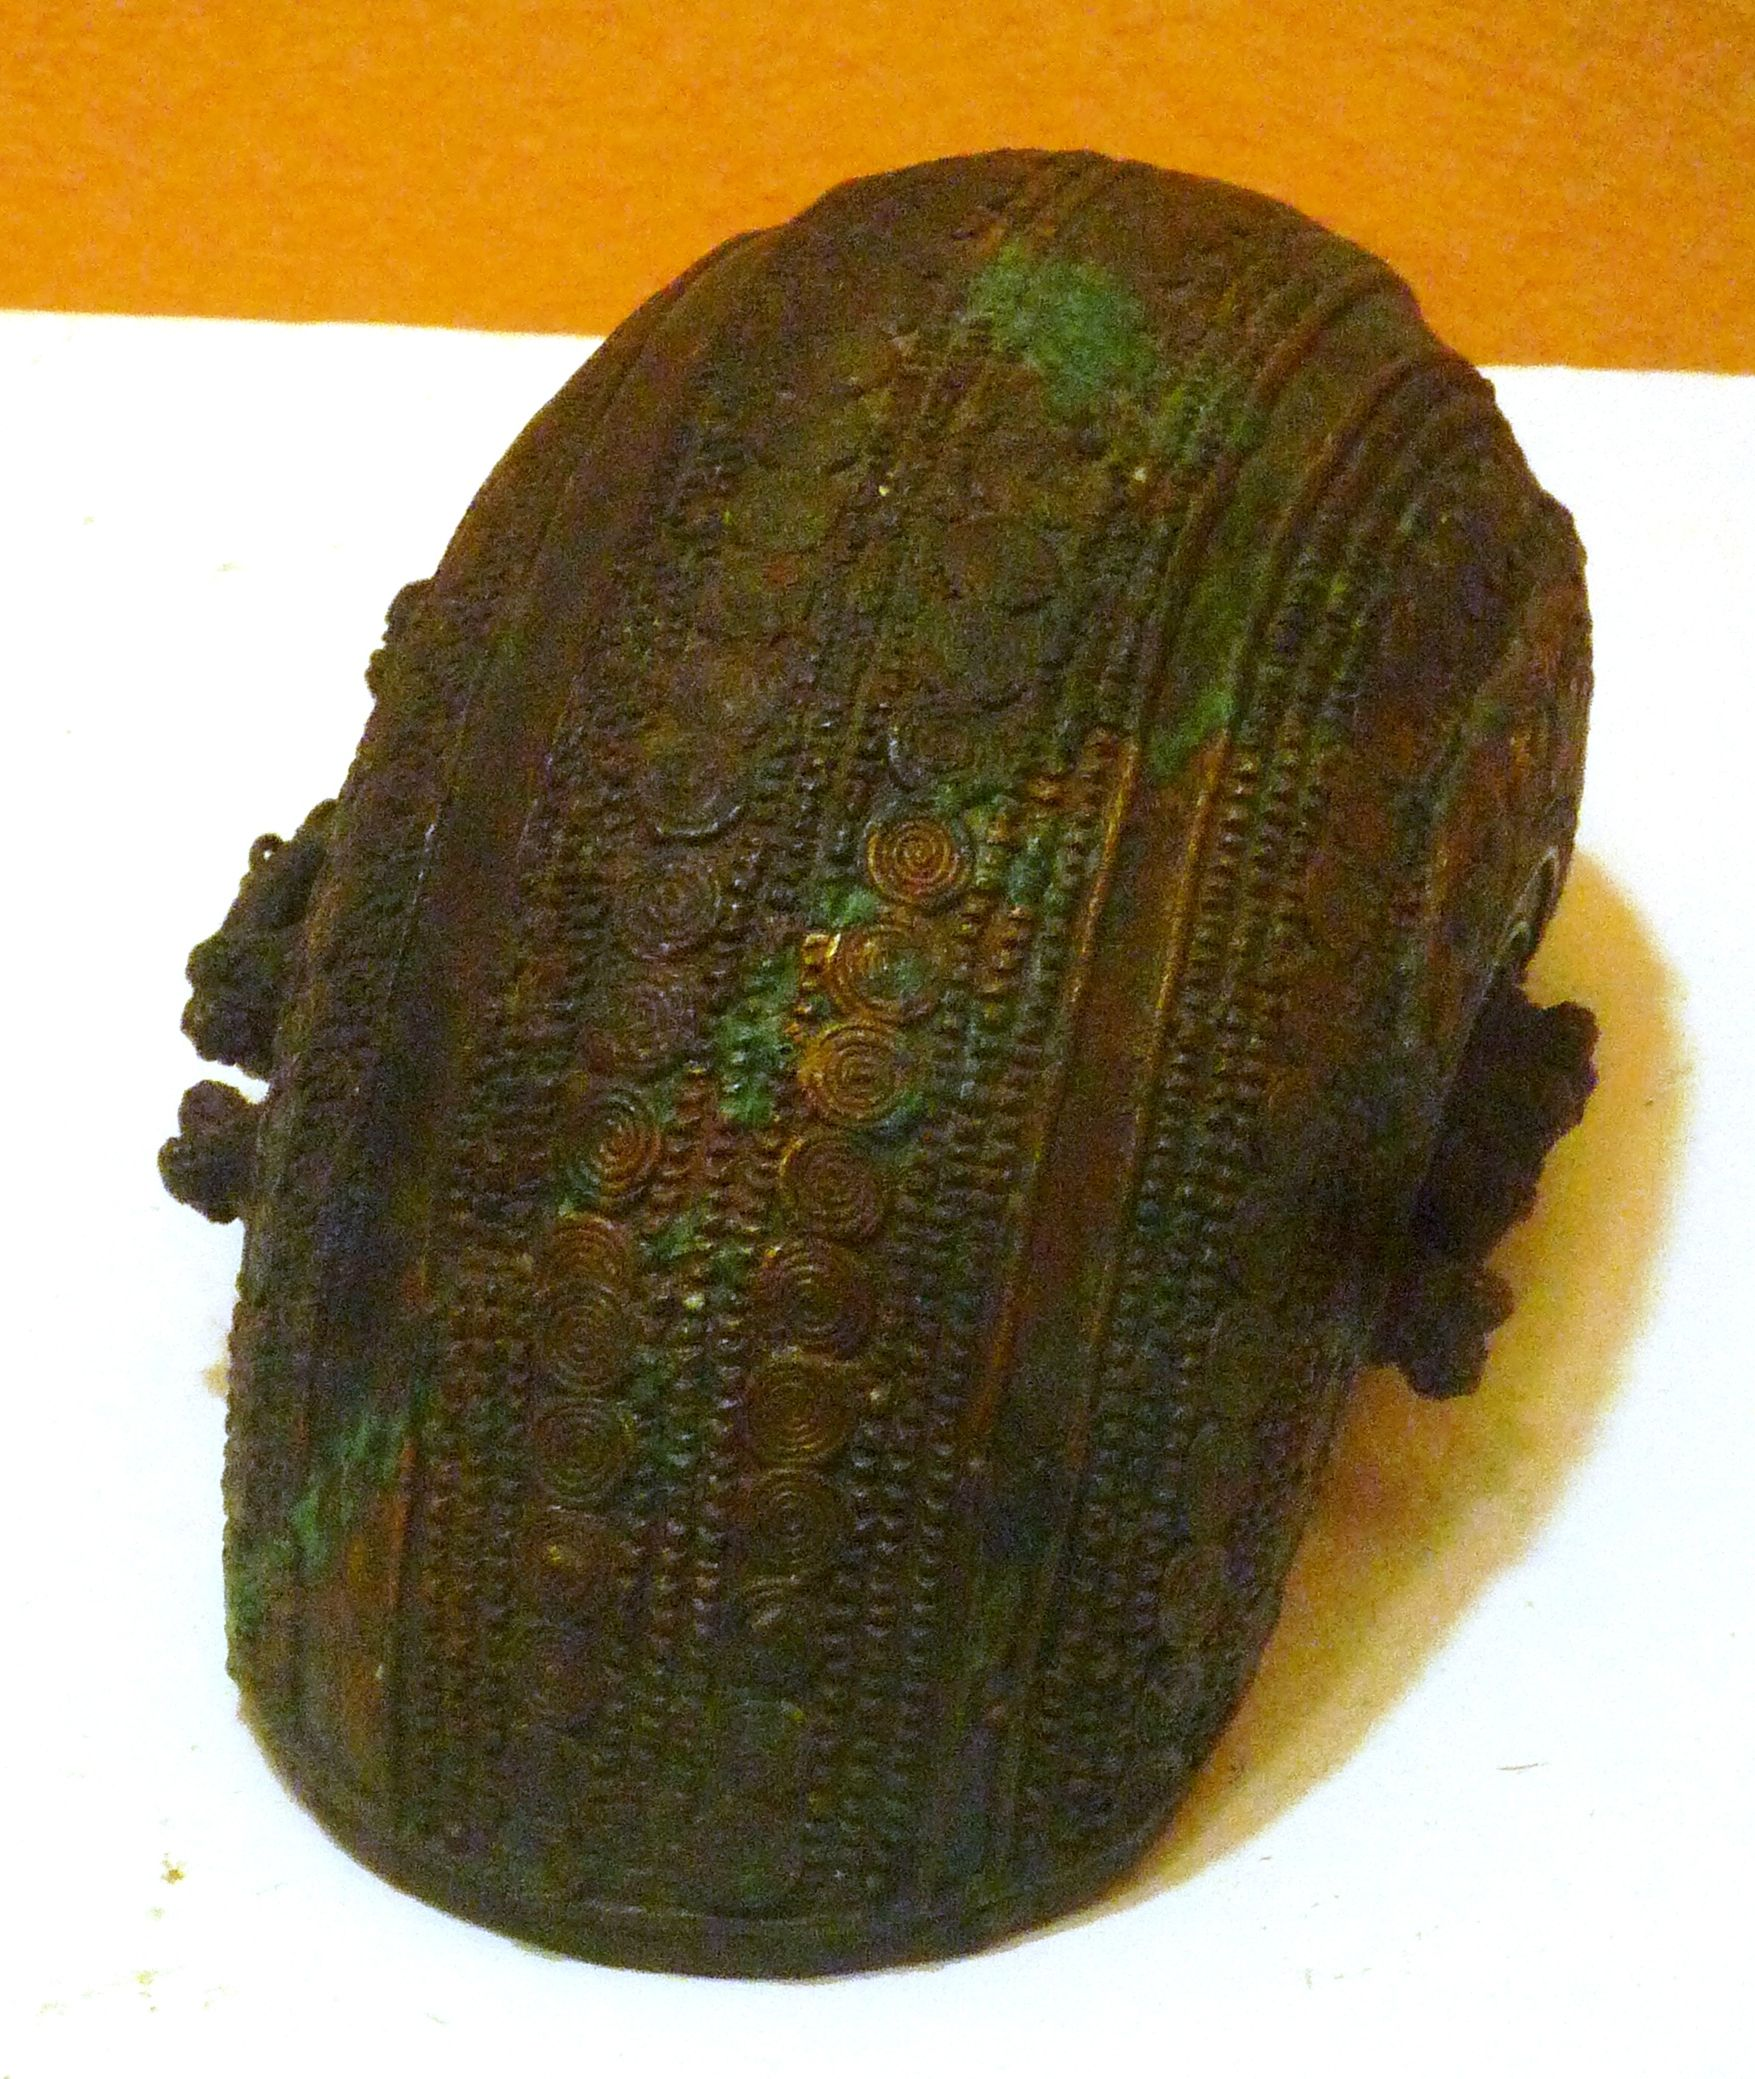 File:Cresentric bowl, bronze, 9th century, Igbo-Ukwu, Nigeria JPG